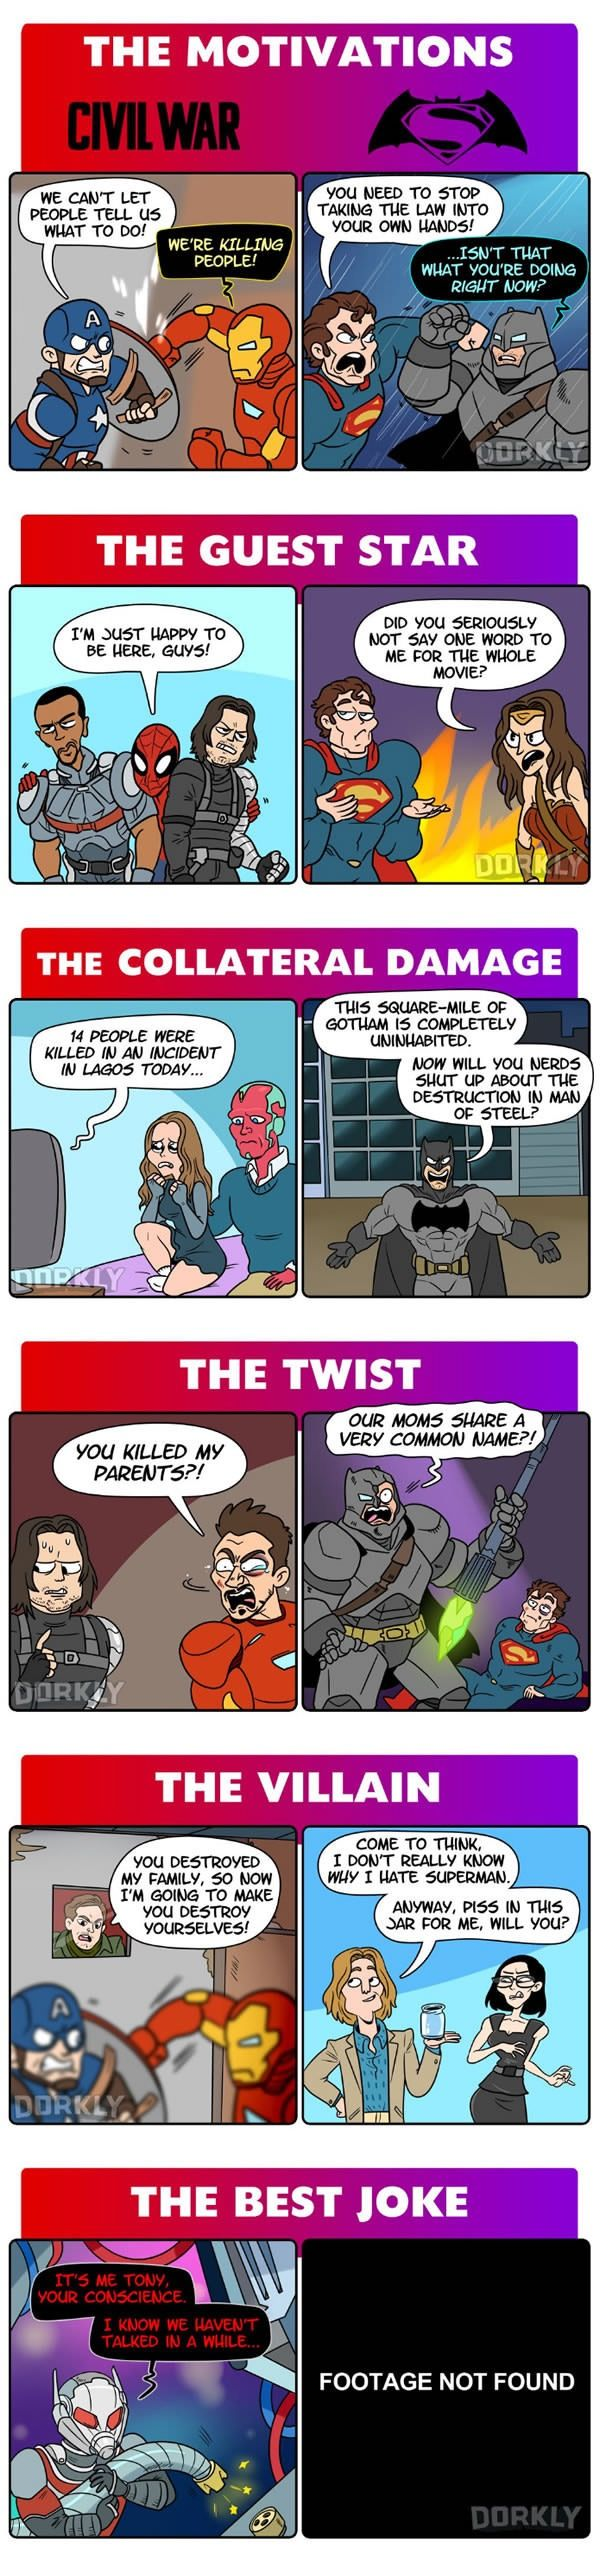 Skype hidden emoticons captain america - Batman V Superman Vs Captain America Civil War Imgur